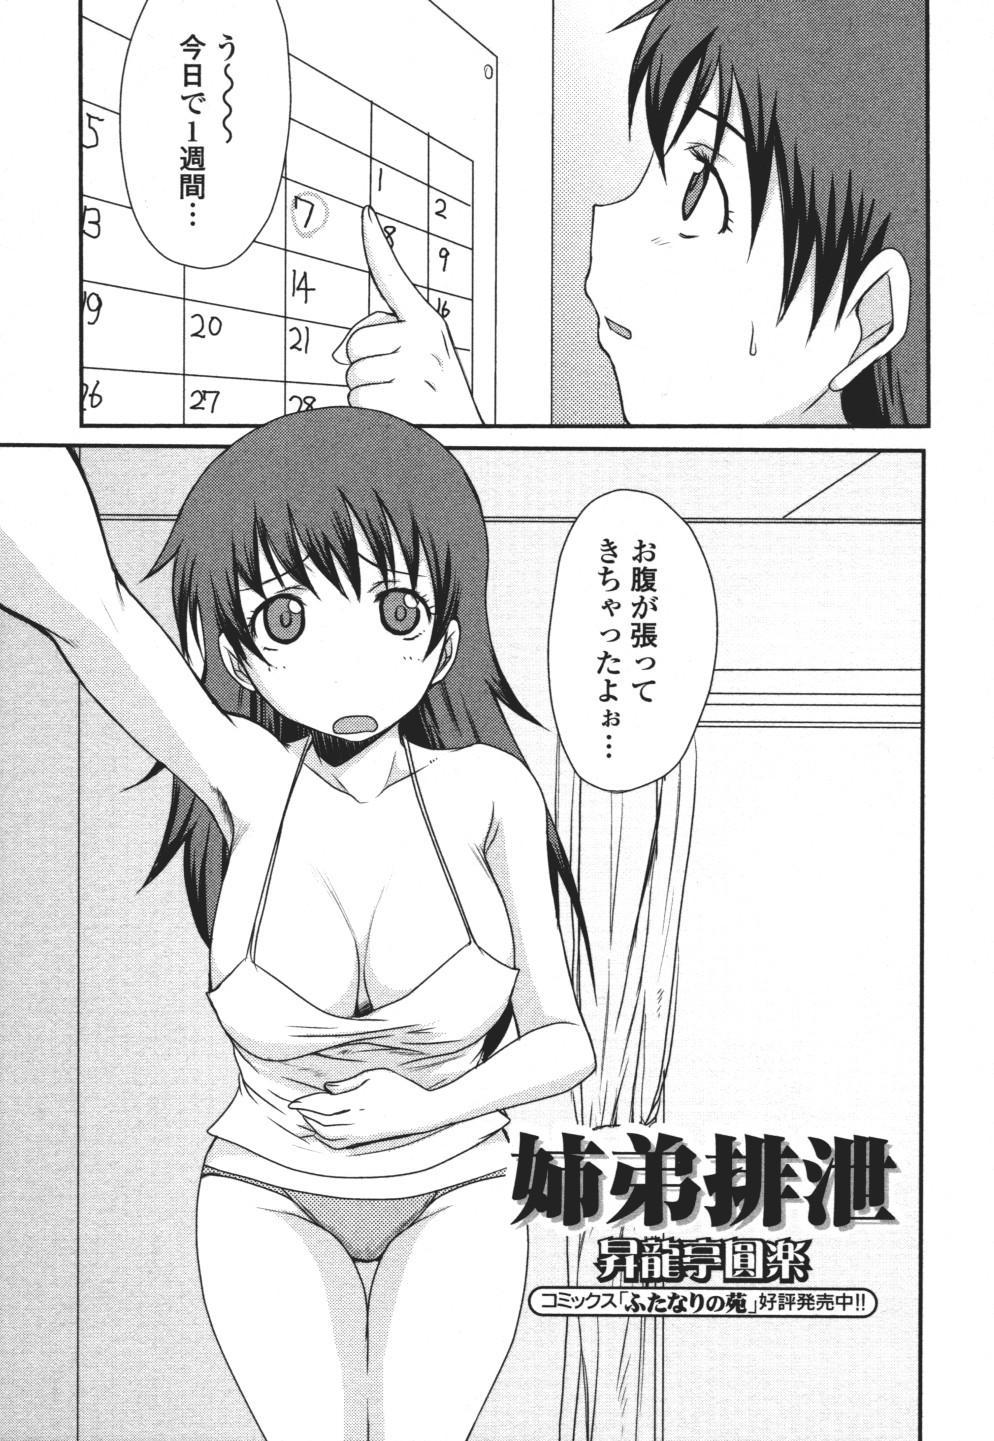 Nozoite wa Ikenai 3 - Do Not Peep! 3 117